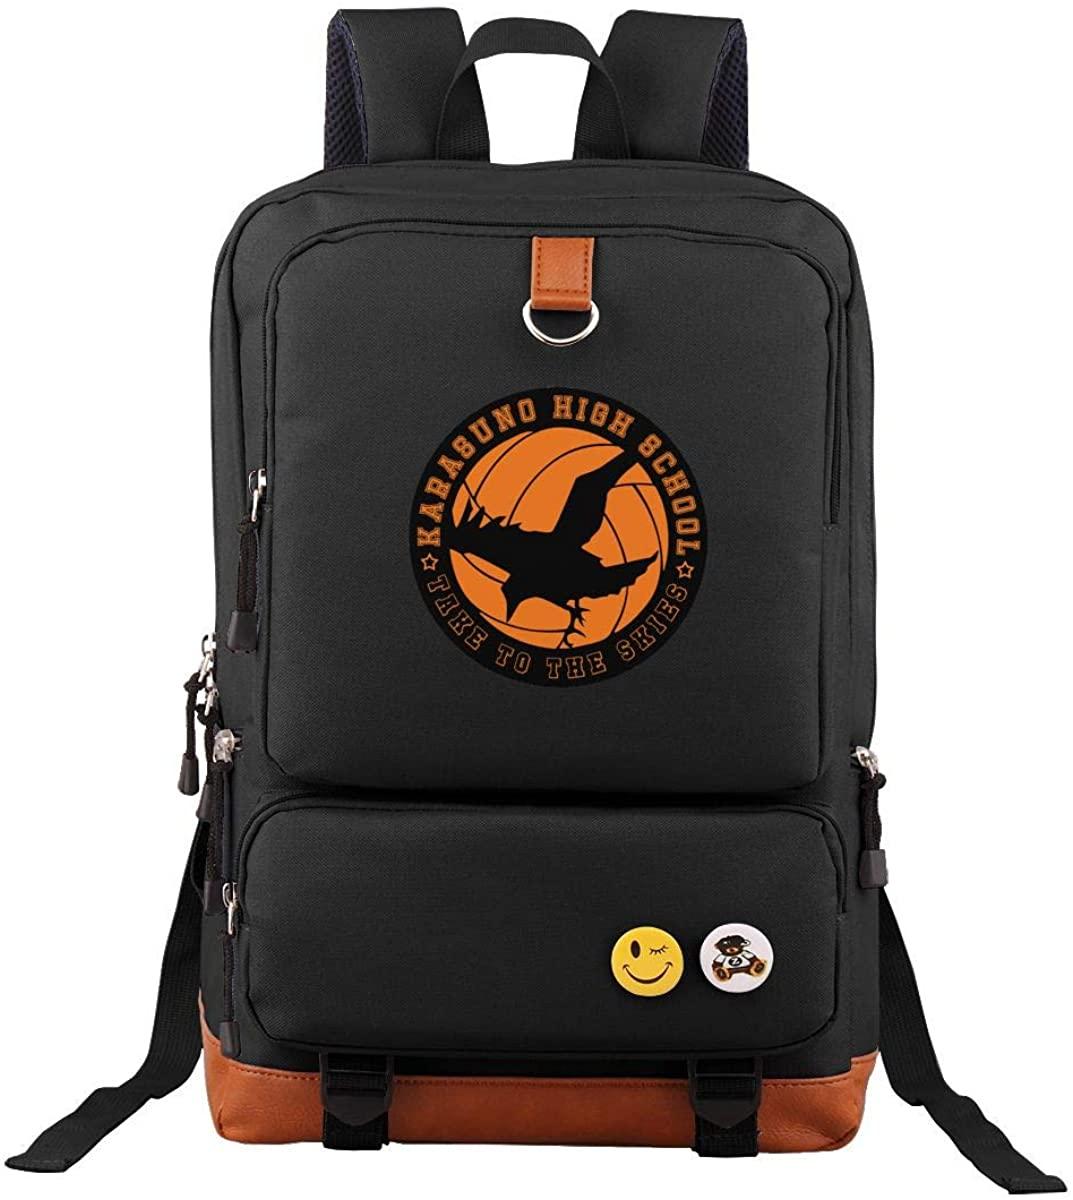 Haiky-Uu!! Men And Women Backpacks, Casual Backpacks Size 11l5w17h Inch